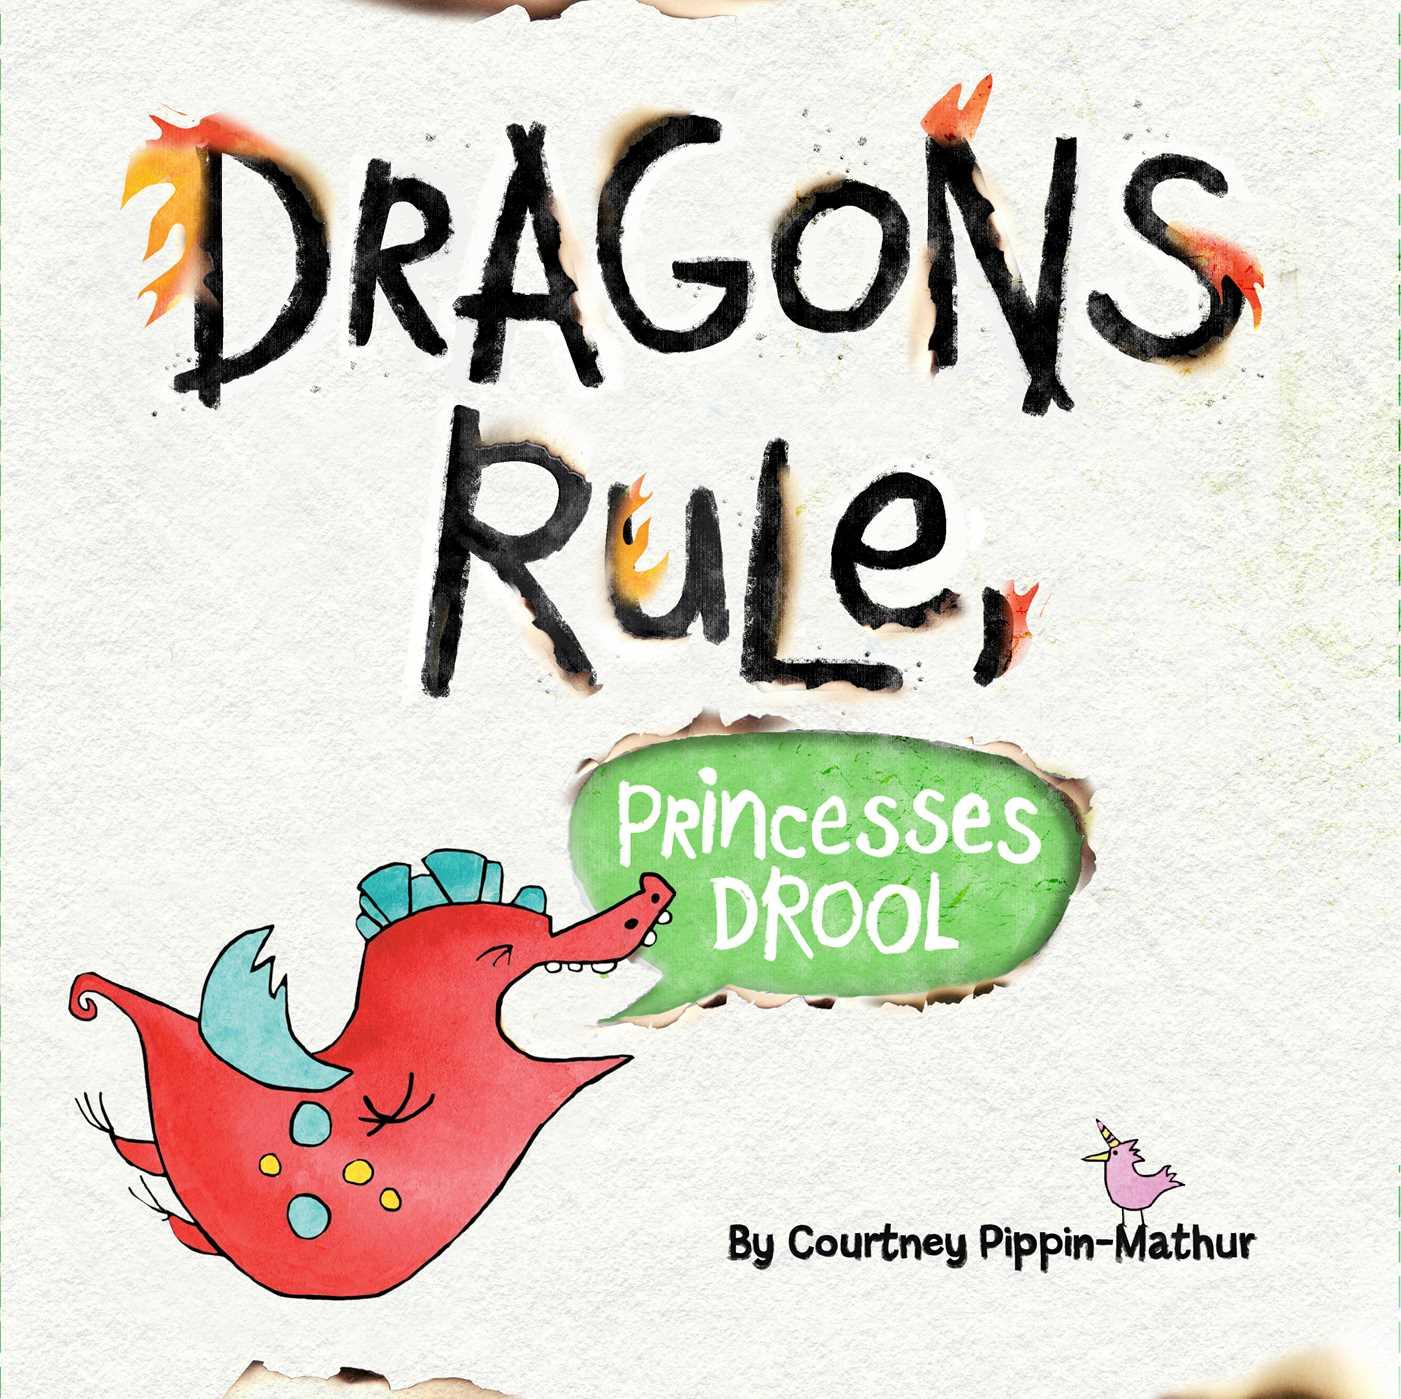 Dragons rule princesses drool 9781481461399 hr